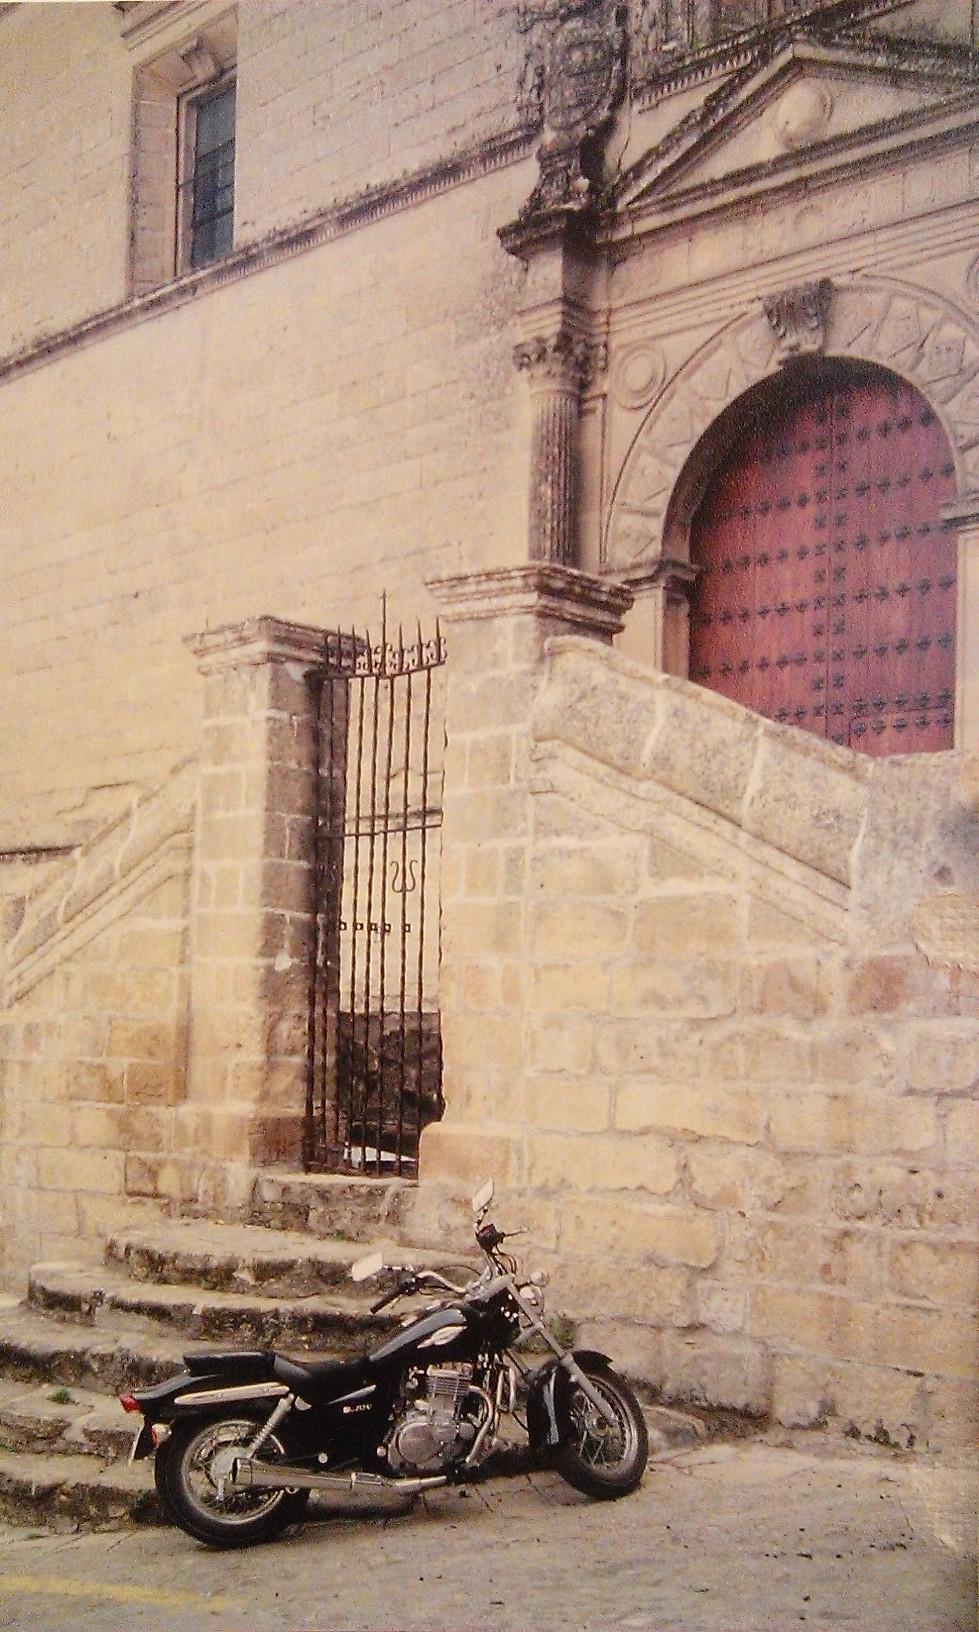 Baéza Renaissance Monumental Ensembles of Úbeda and Baeza - Spain Cathrin Eszbach